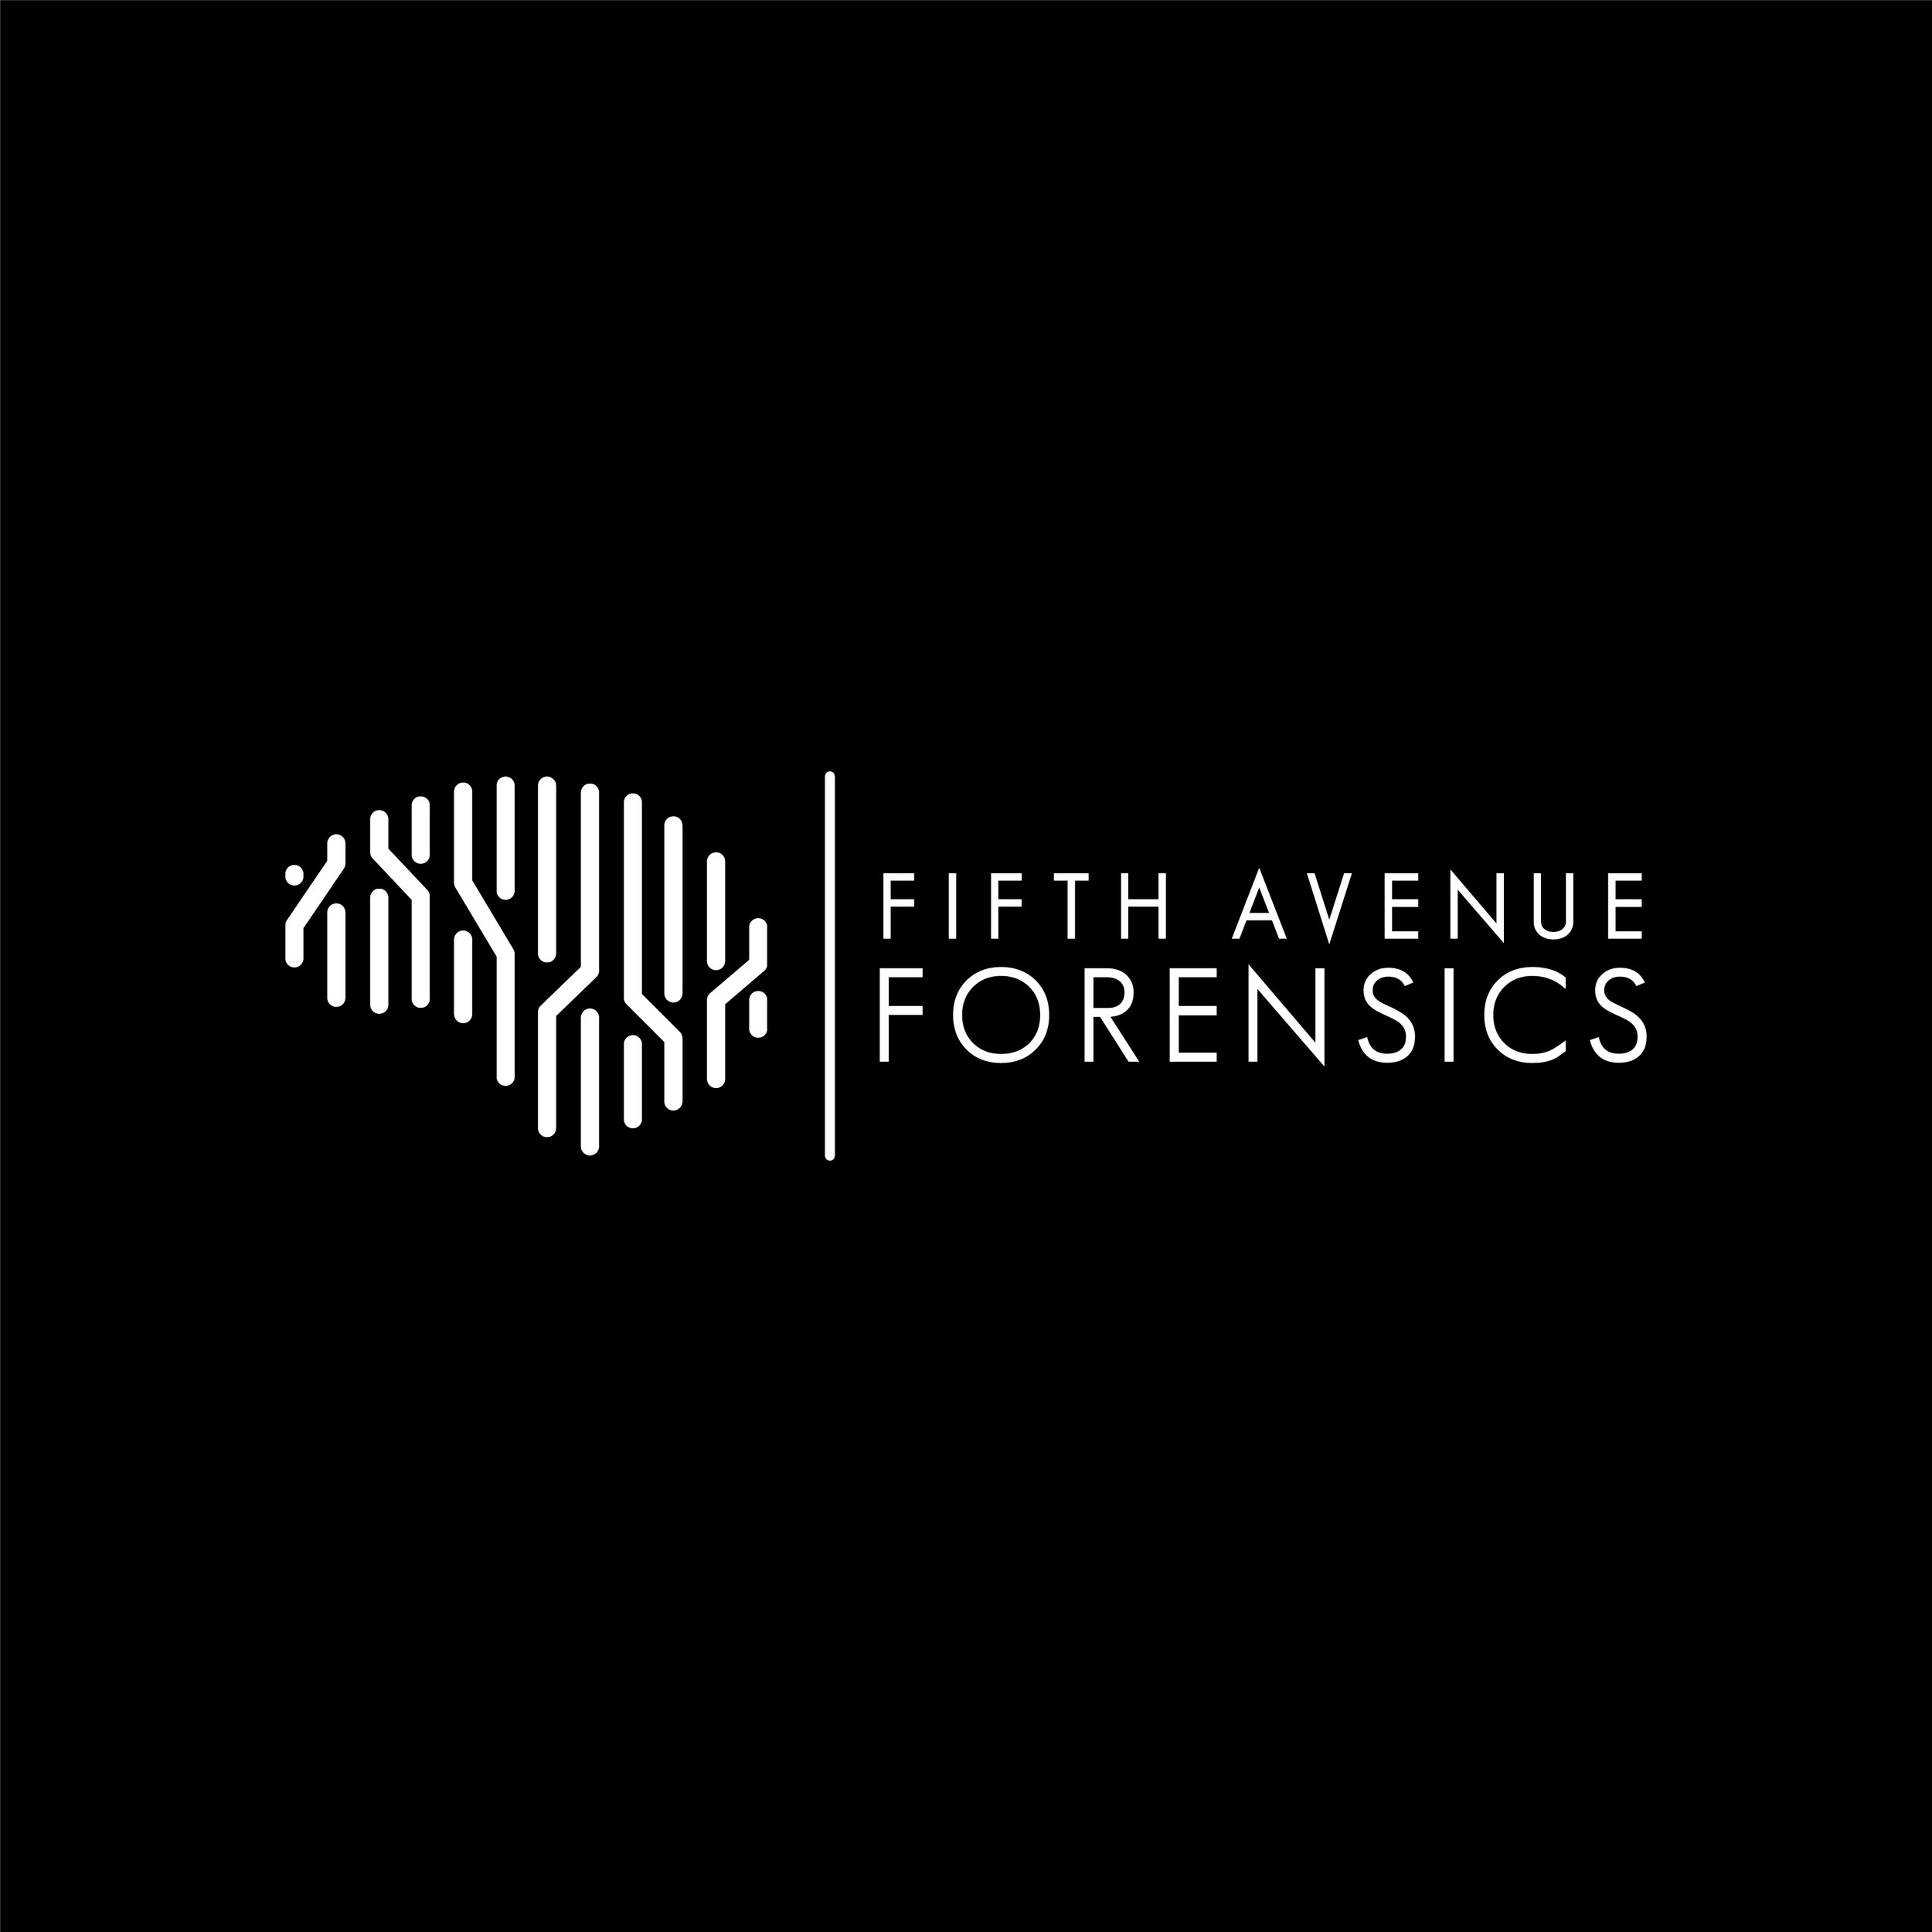 Fifth Avenue Forensics-01.jpg